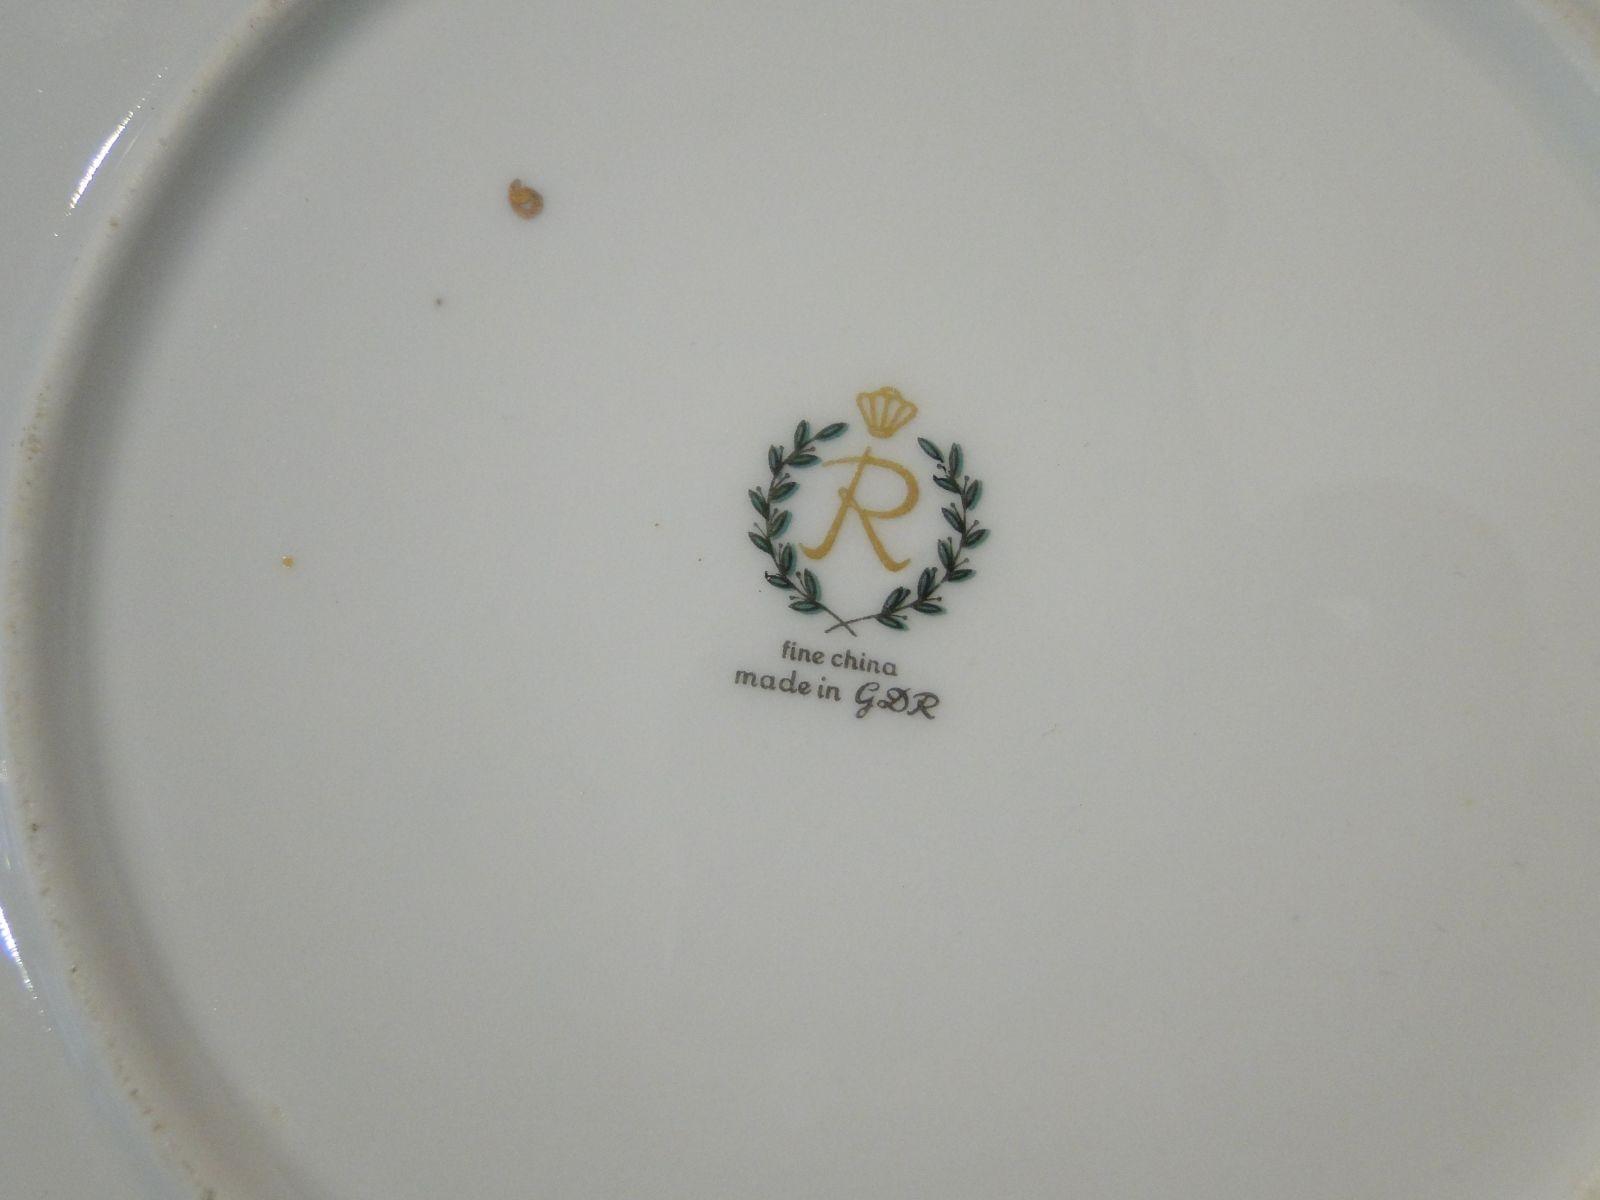 DSC08458.JPG (1600�1200)